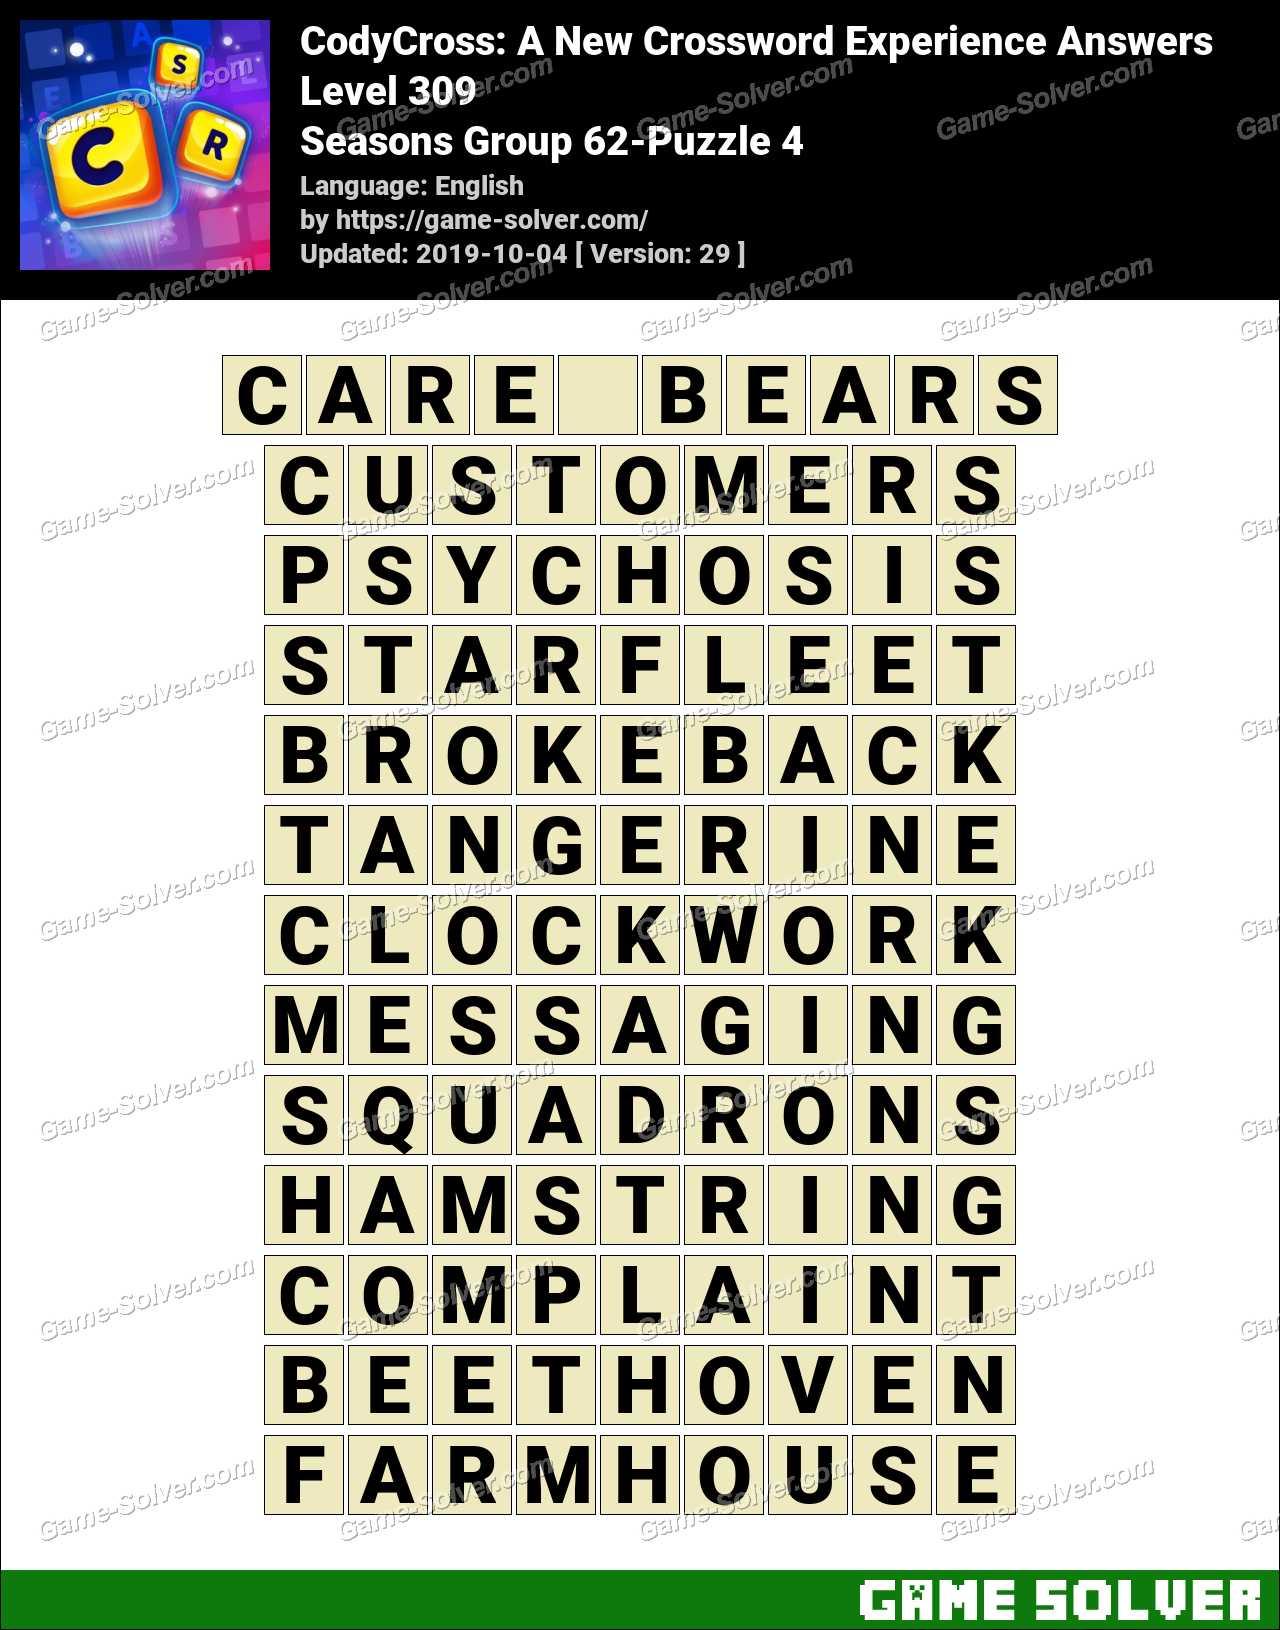 CodyCross Seasons Group 62-Puzzle 4 Answers